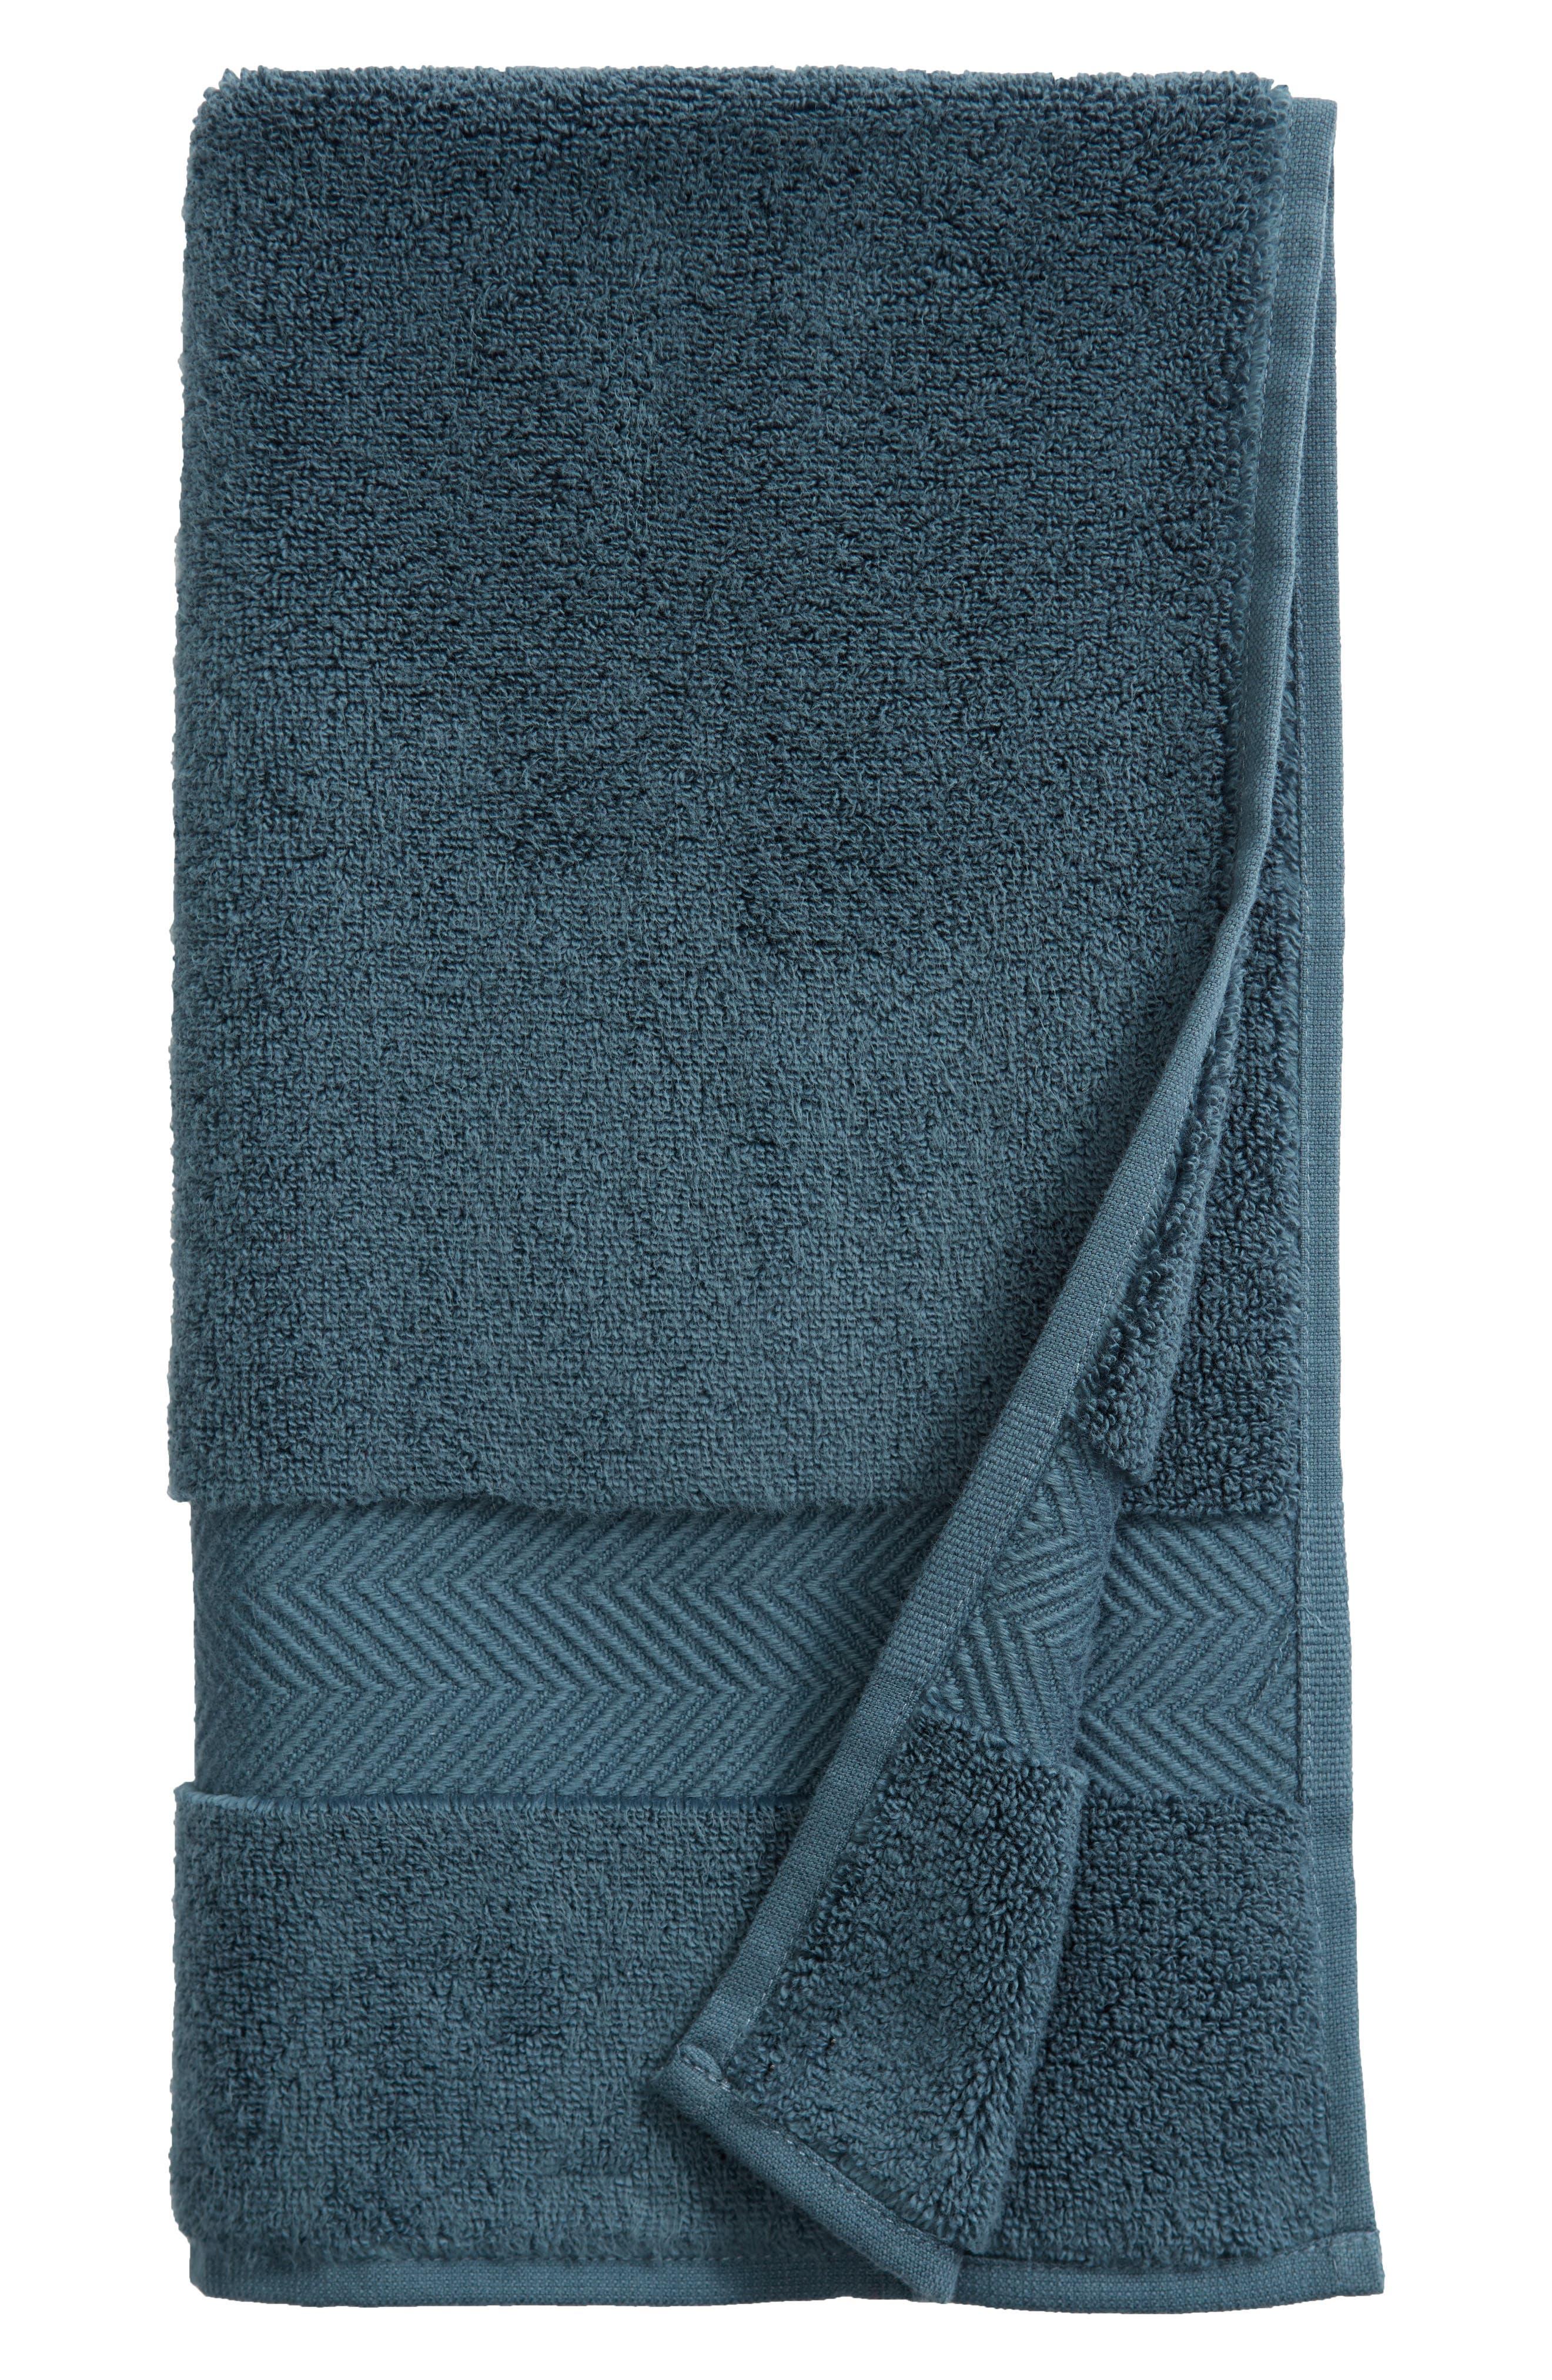 Hydrocotton Hand Towel,                         Main,                         color, TEAL GAZER